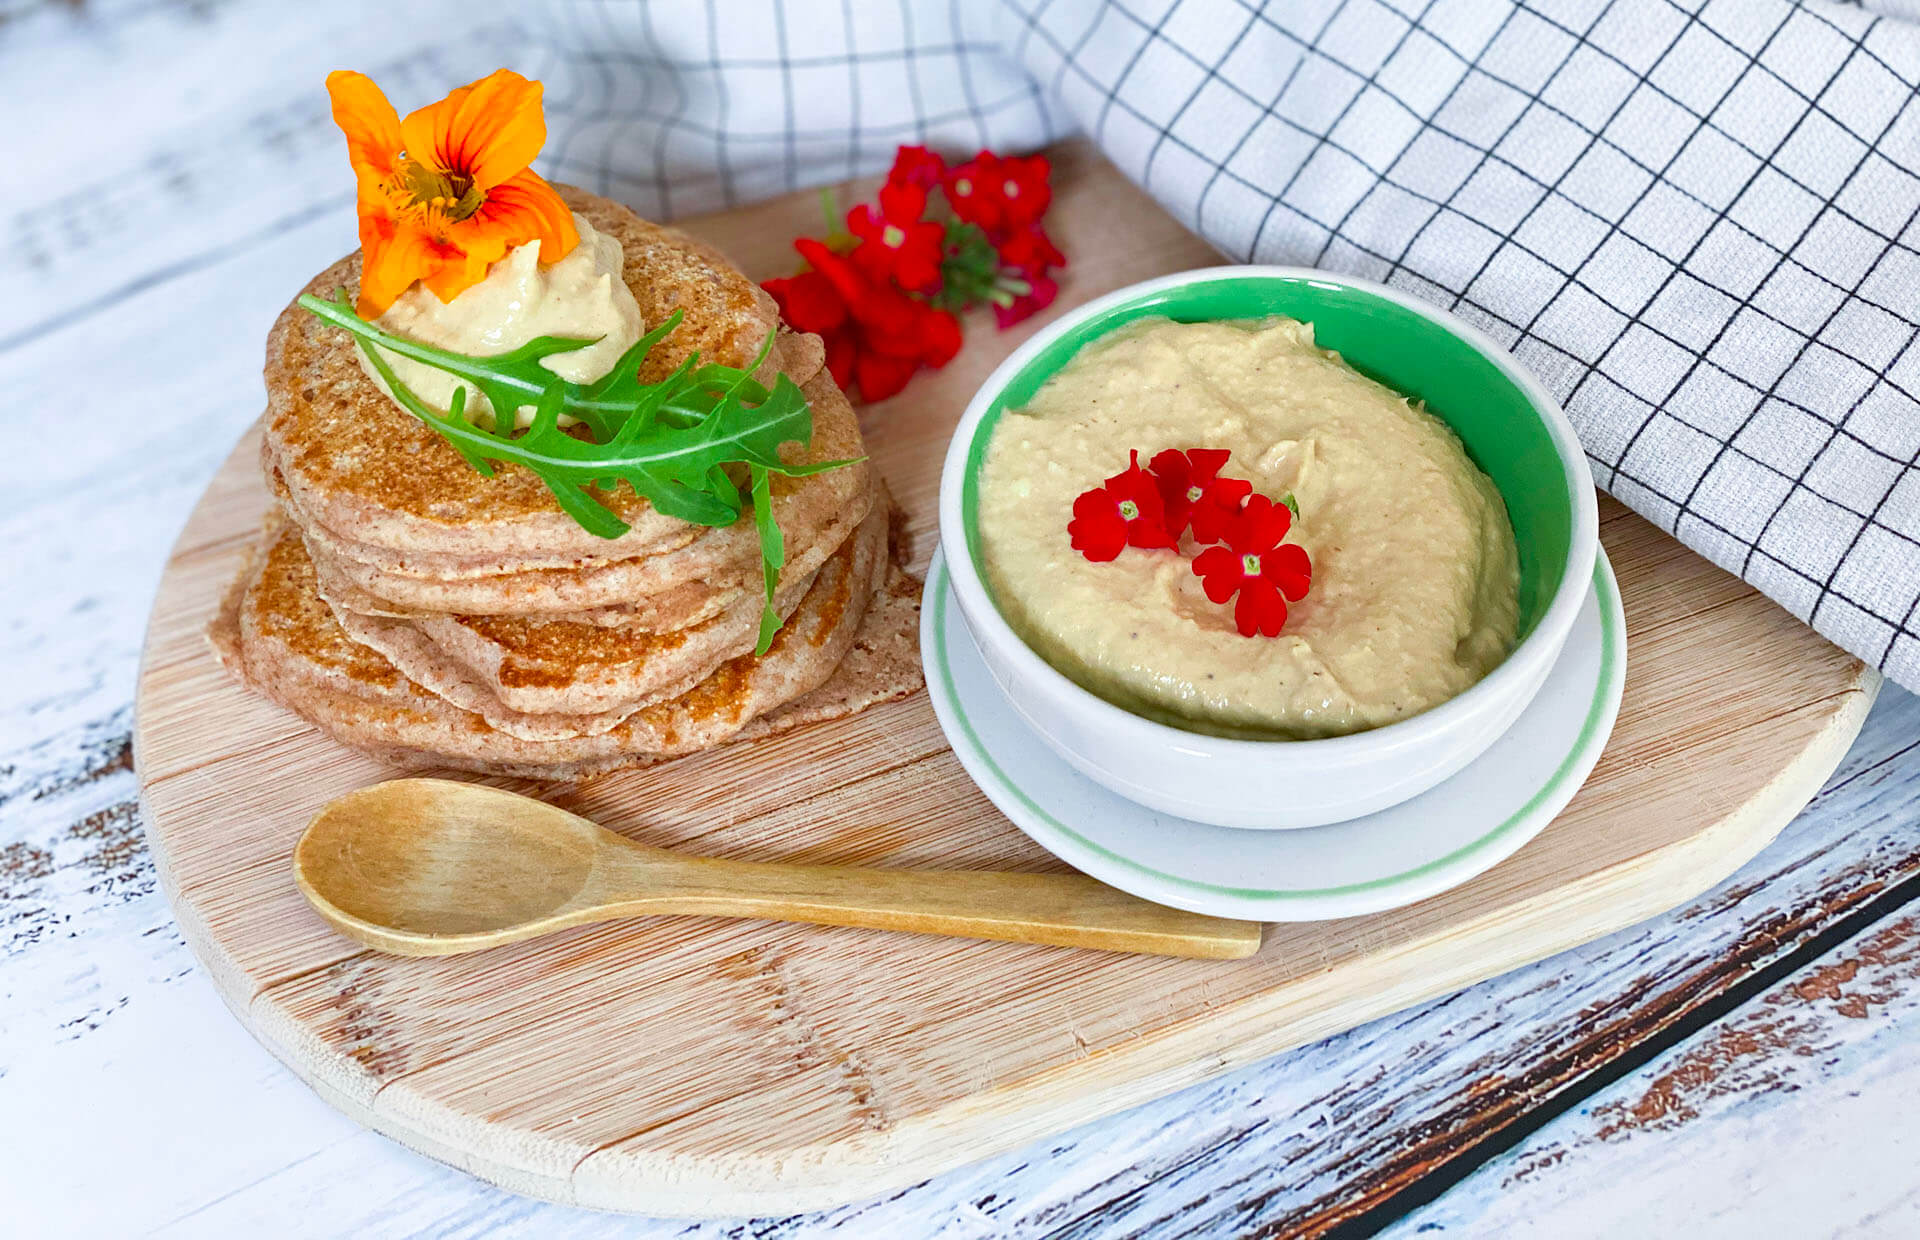 namaz od piletine i šargarepe, domaći namaz, zdrav namaz, Iceberg Salat Centar